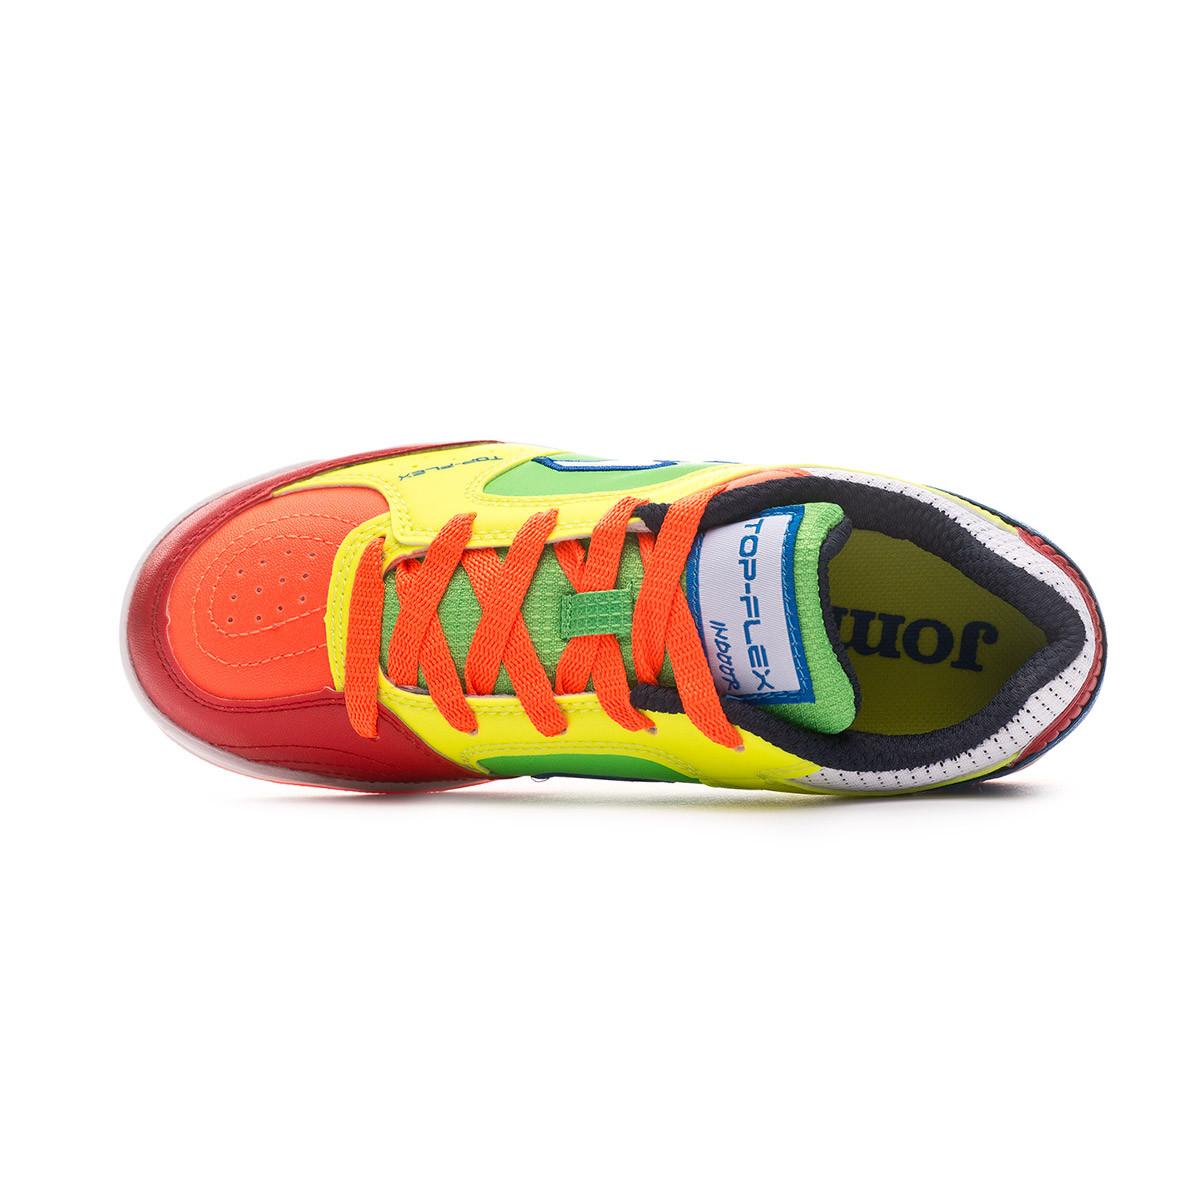 ee41a73dce7 Futsal Boot Joma Top Flex Niño Multicolor - Football store Fútbol Emotion